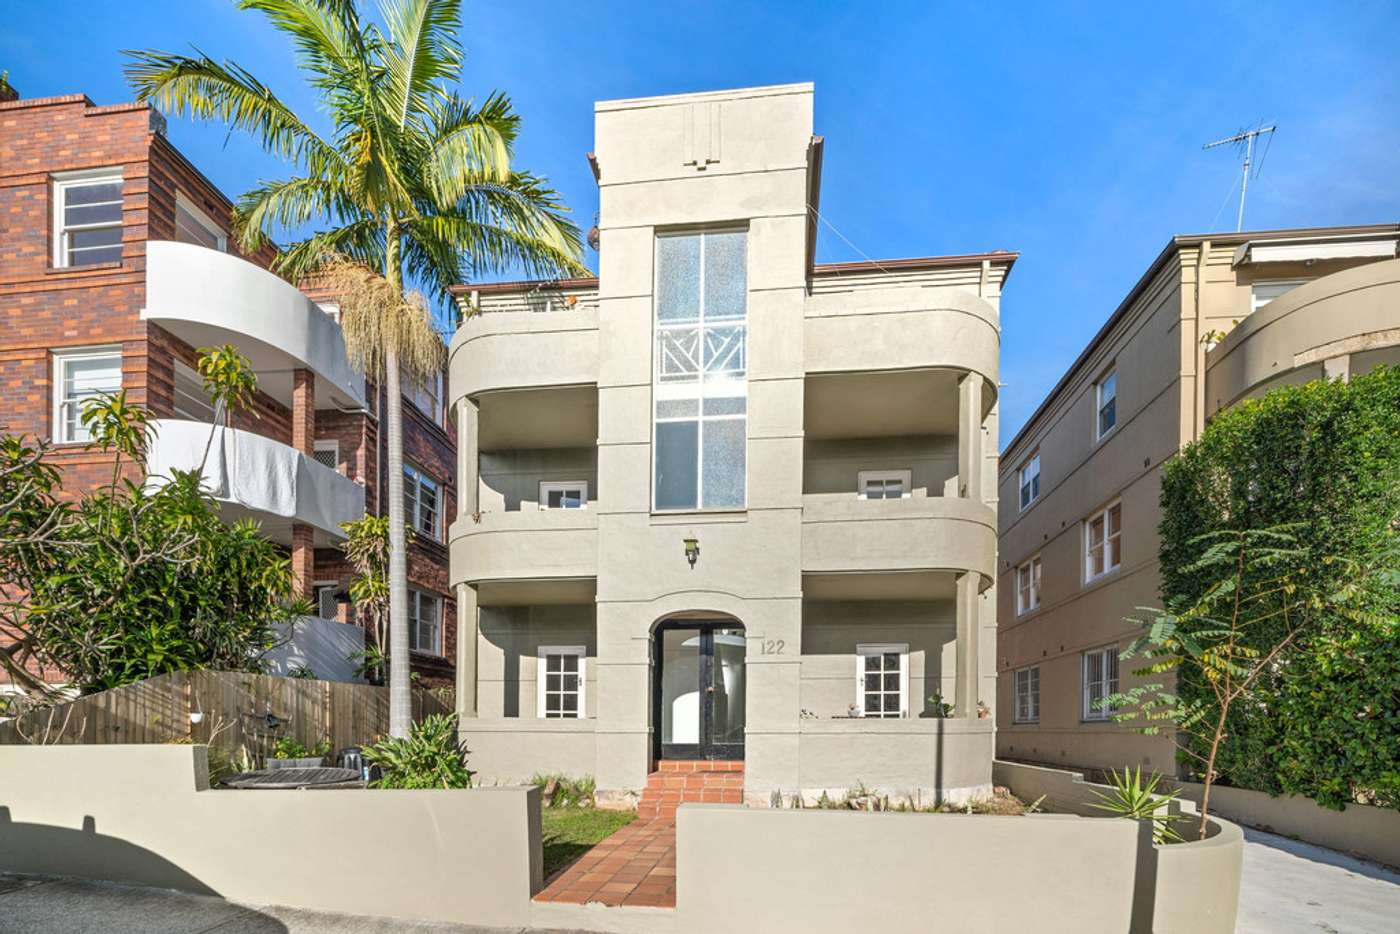 Main view of Homely blockOfUnits listing, 122 Francis Street, Bondi Beach NSW 2026